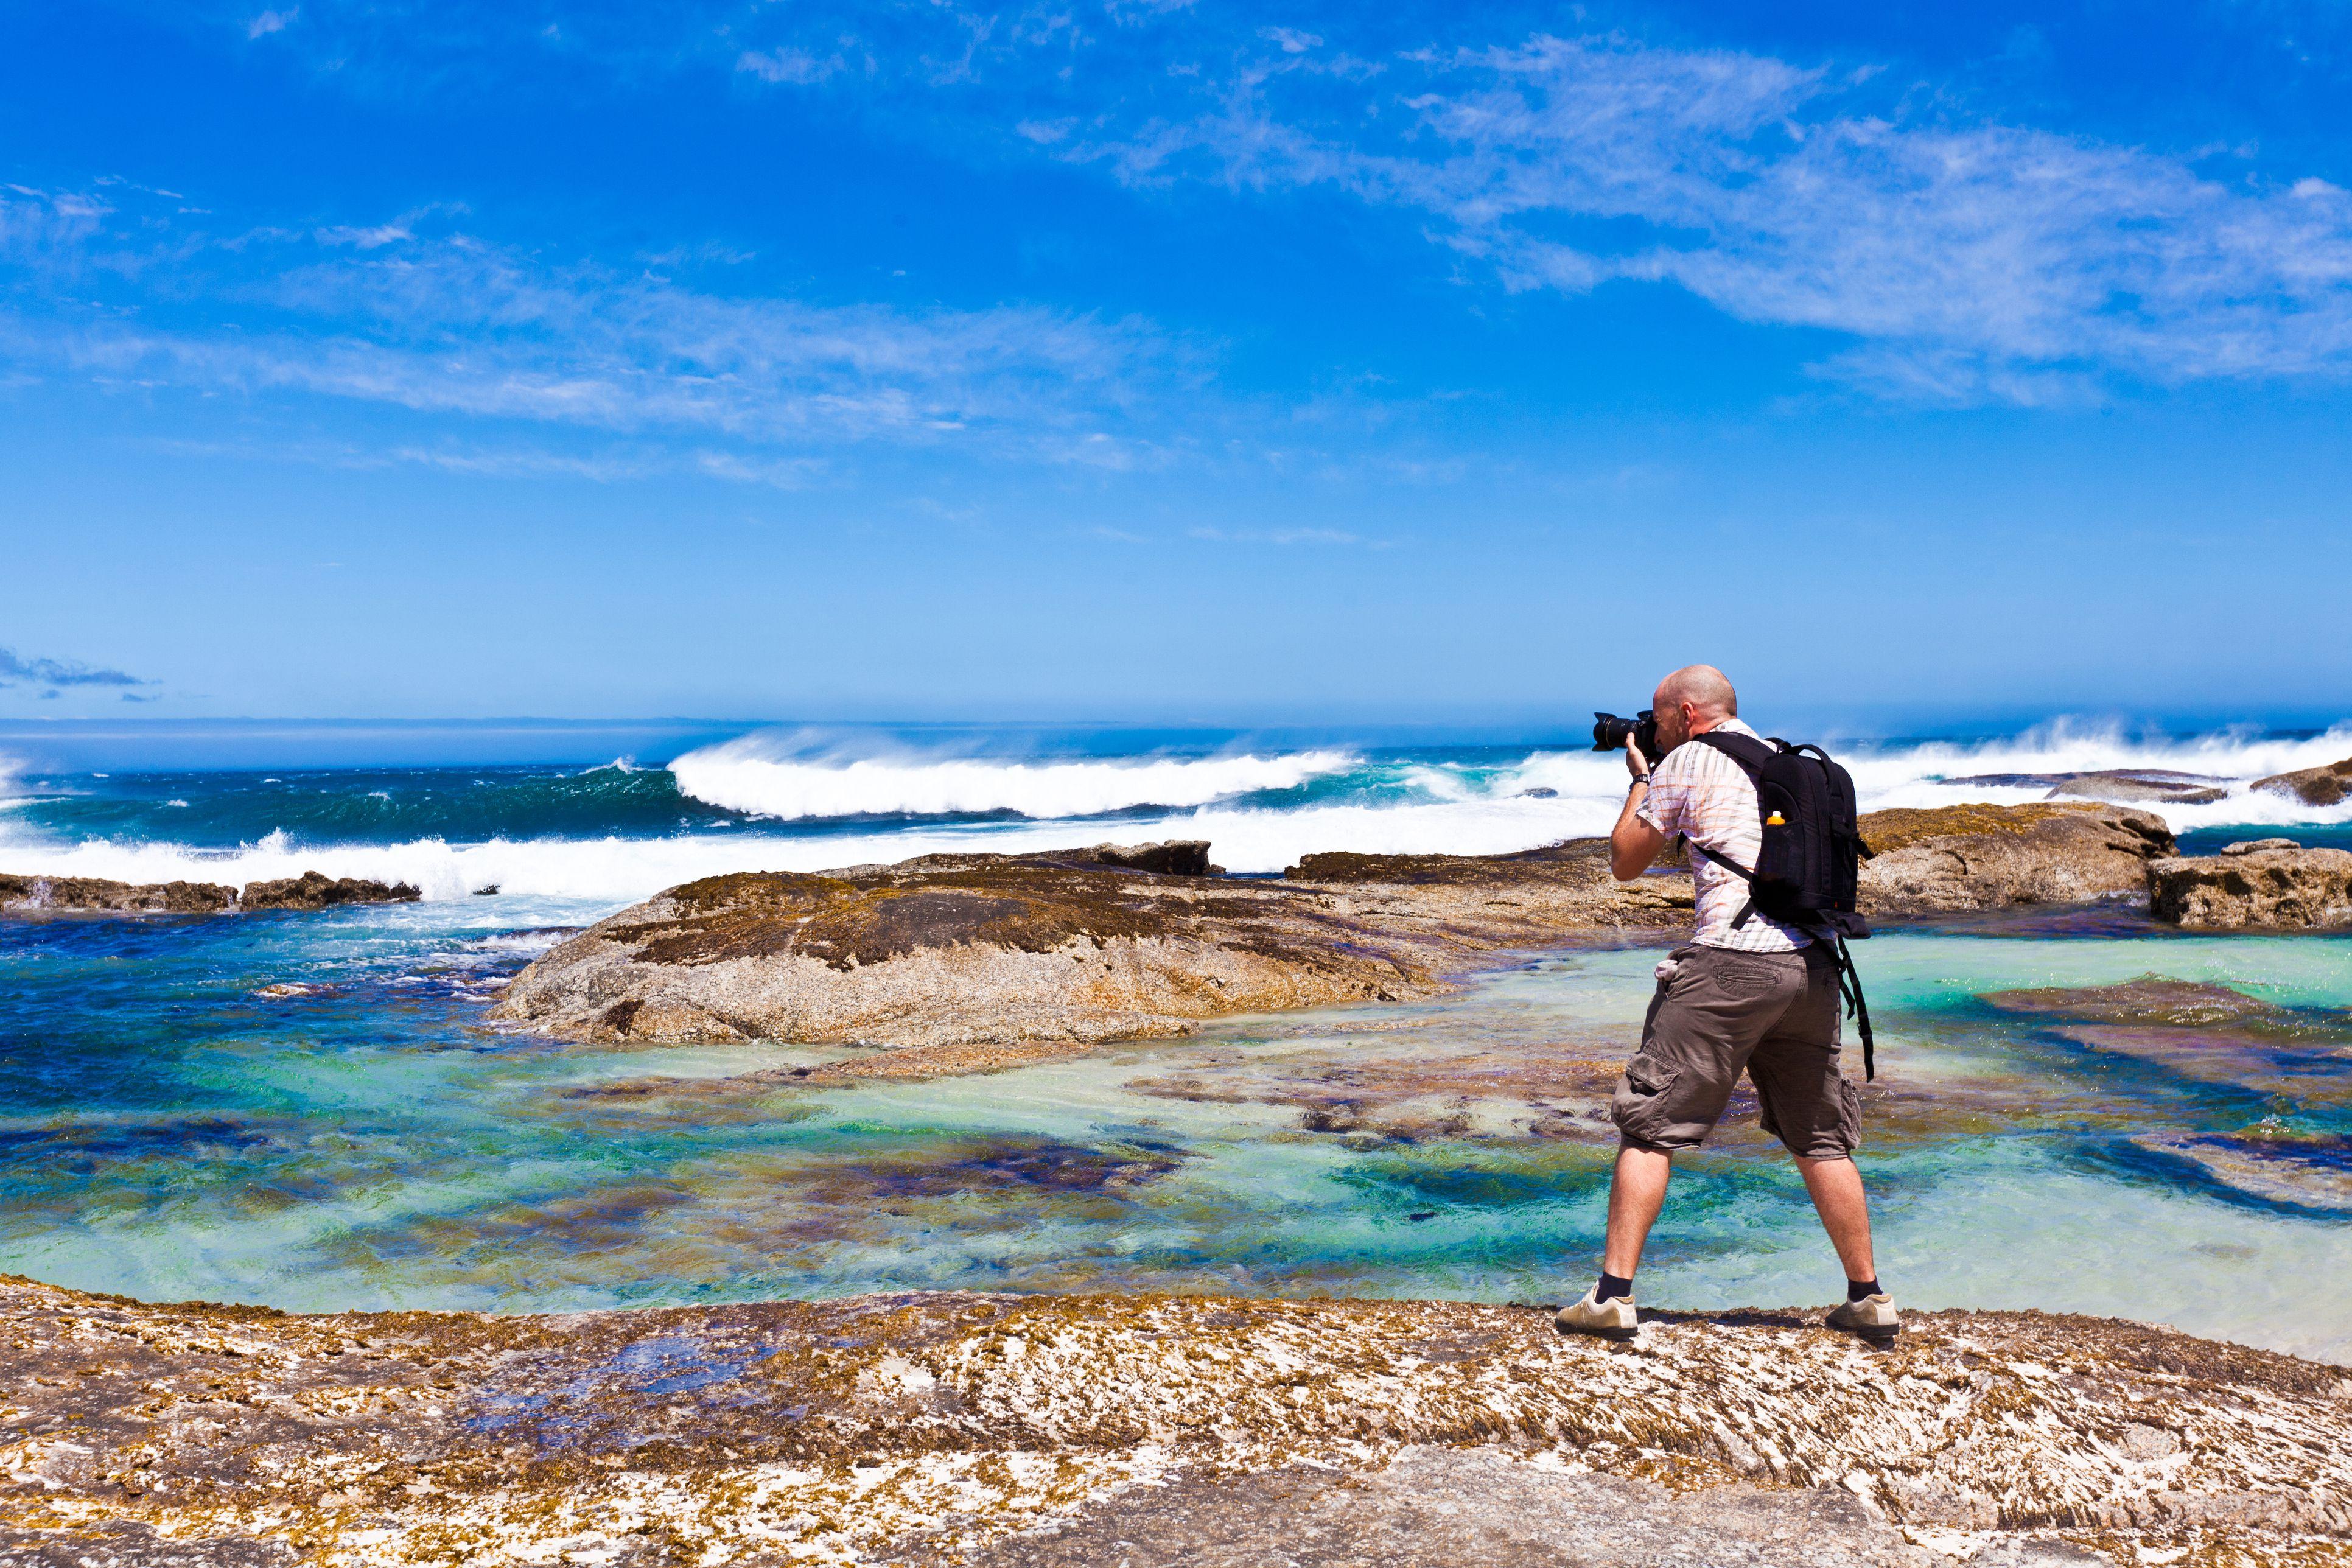 Photographer at coastline